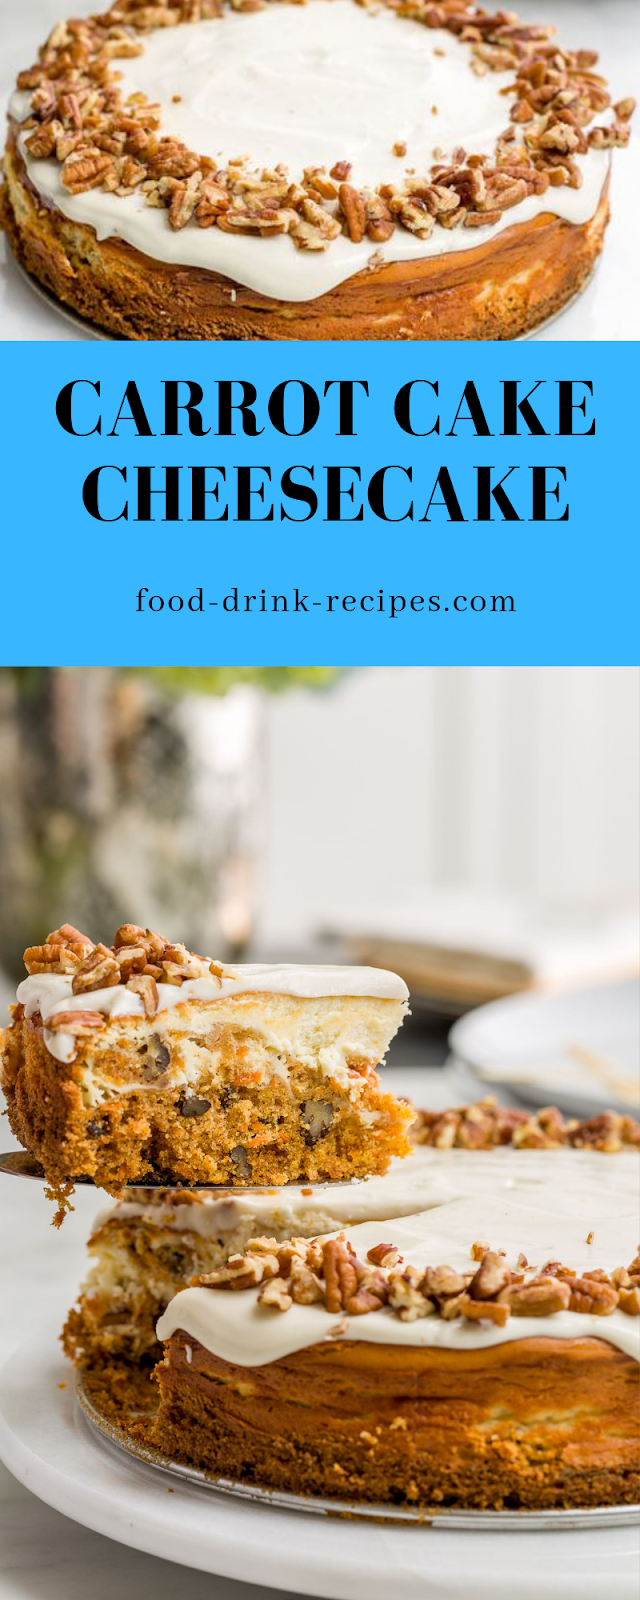 Carrot Cake Cheesecake - food-drink-recipes.com